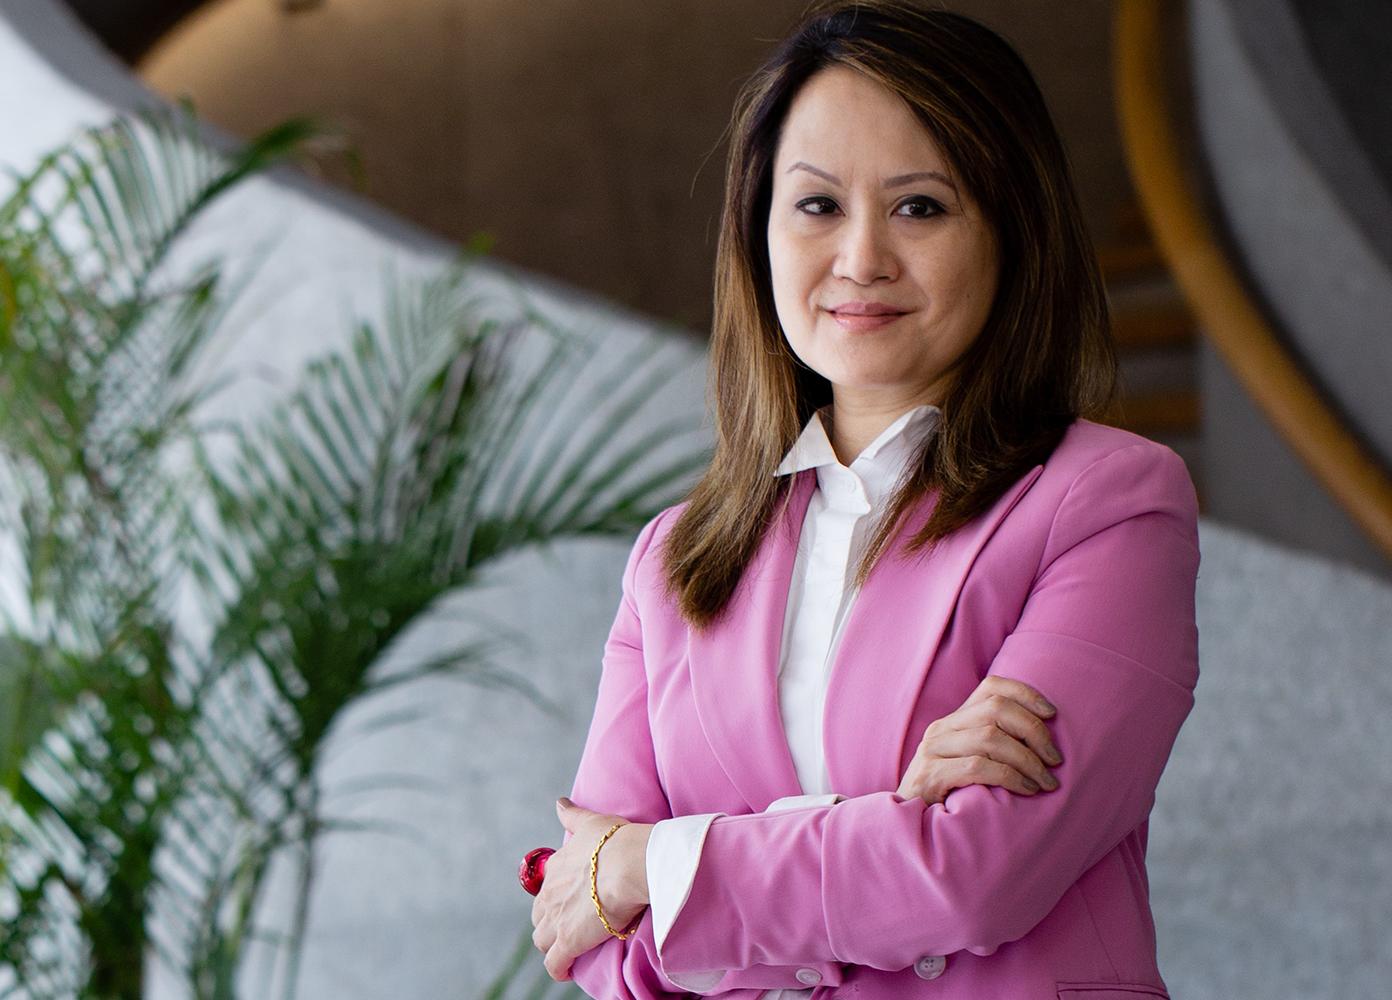 Alumni Spotlight: Ingrid Pui Yee Chu 朱珮瑿 (BFA '93)